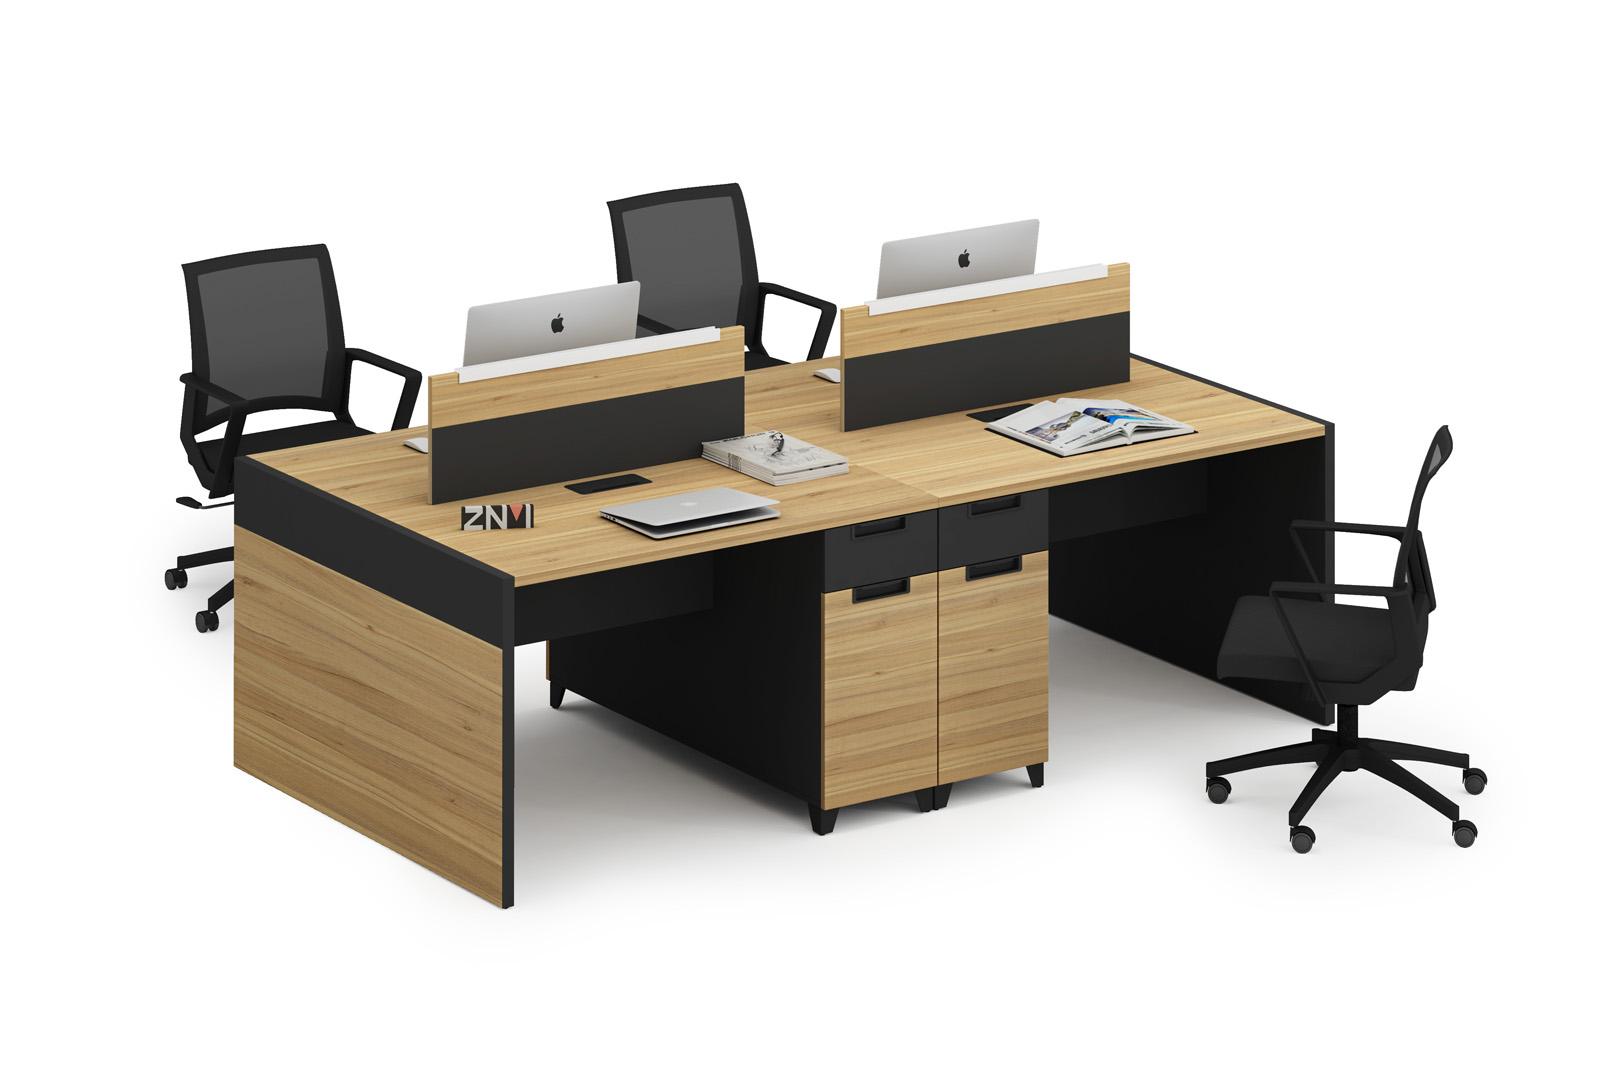 2 Person Workstation New Design K-WC1206